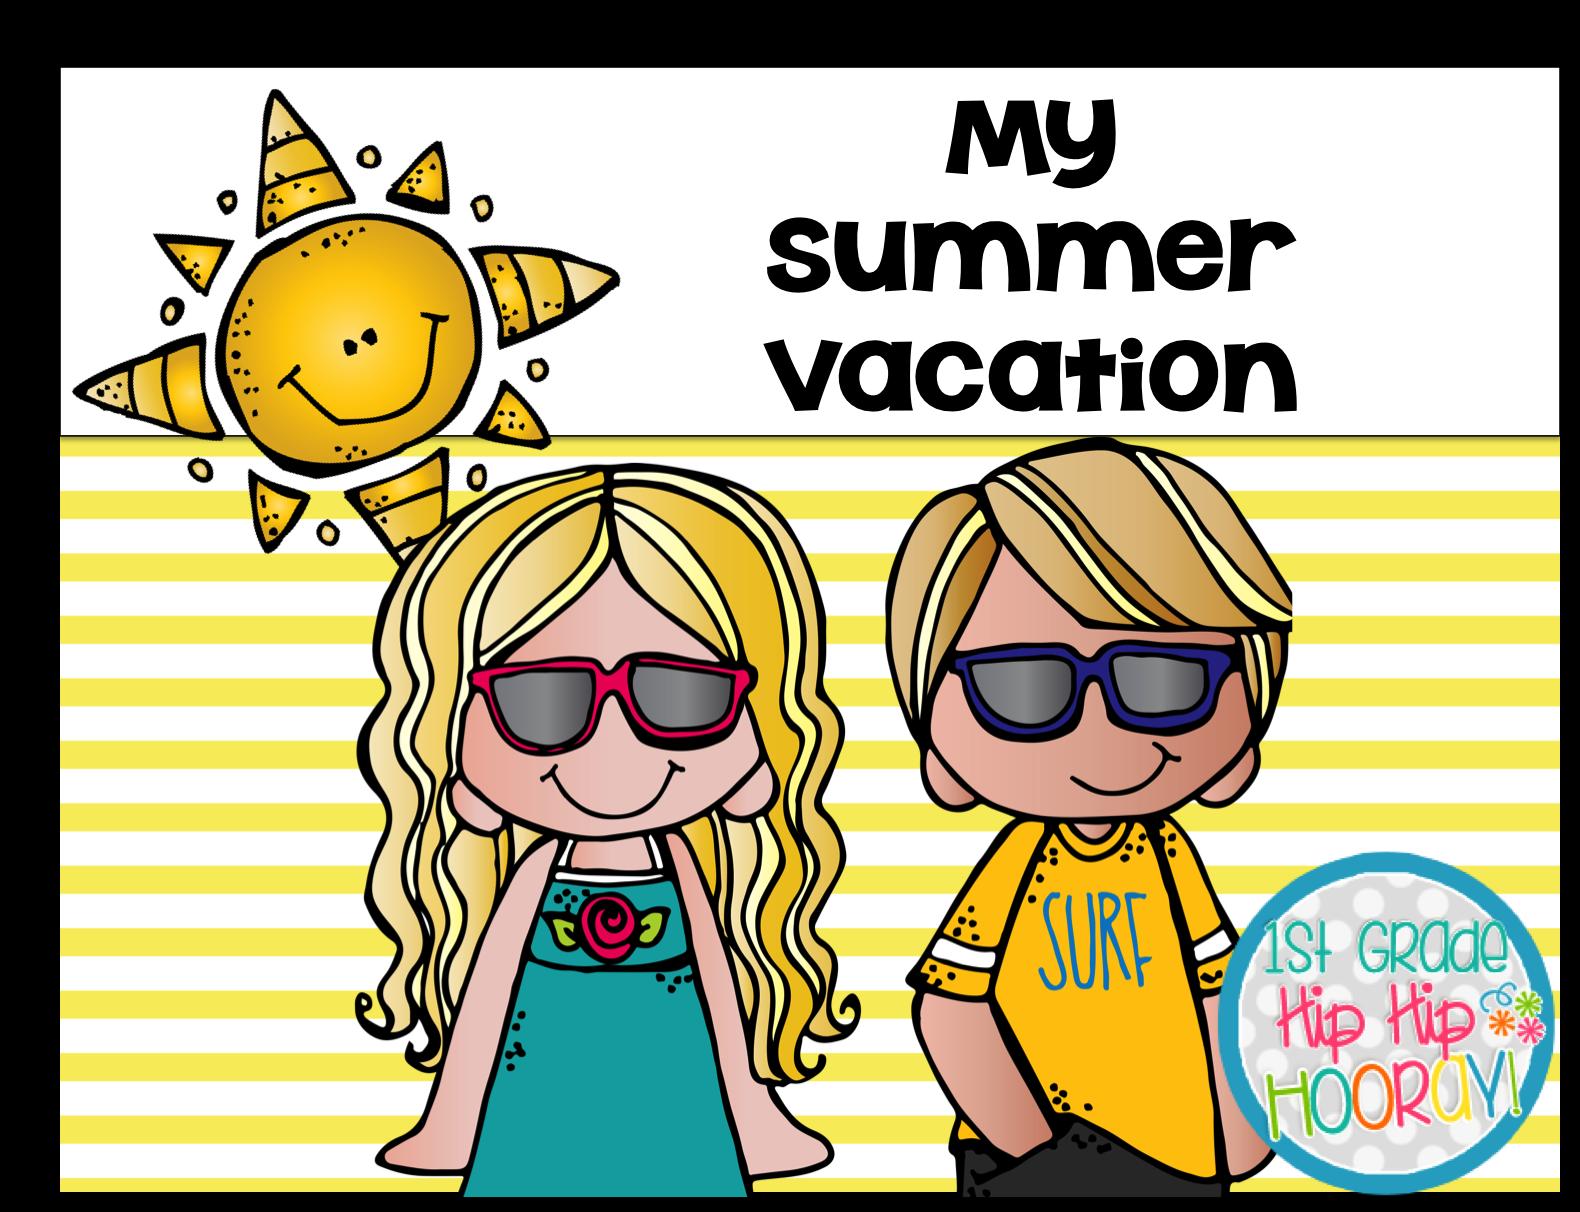 1st Grade Hip Hip Hooray My Summer Vacation Writing